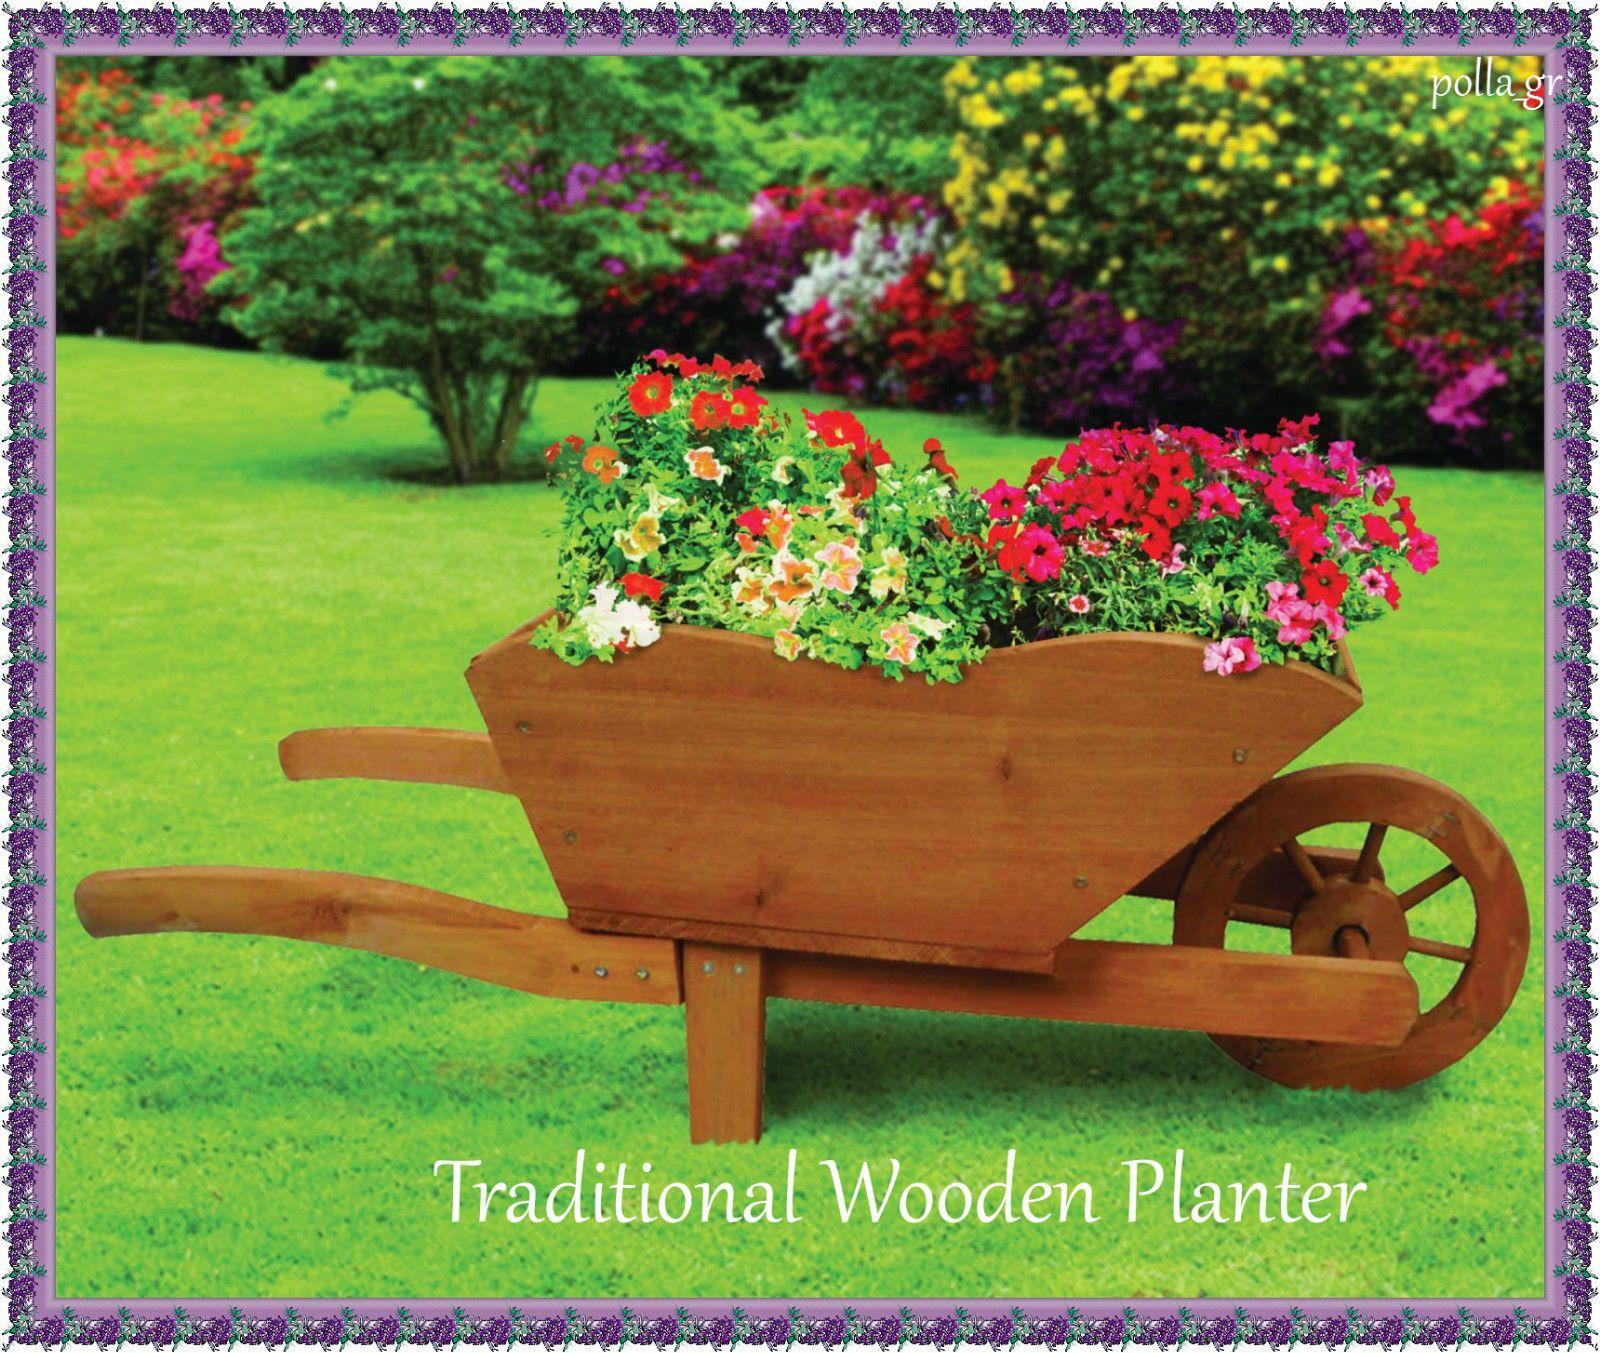 Garden Wooden Planter Flower Box Decor Wagon Wheelbarrow Patio Yard ...